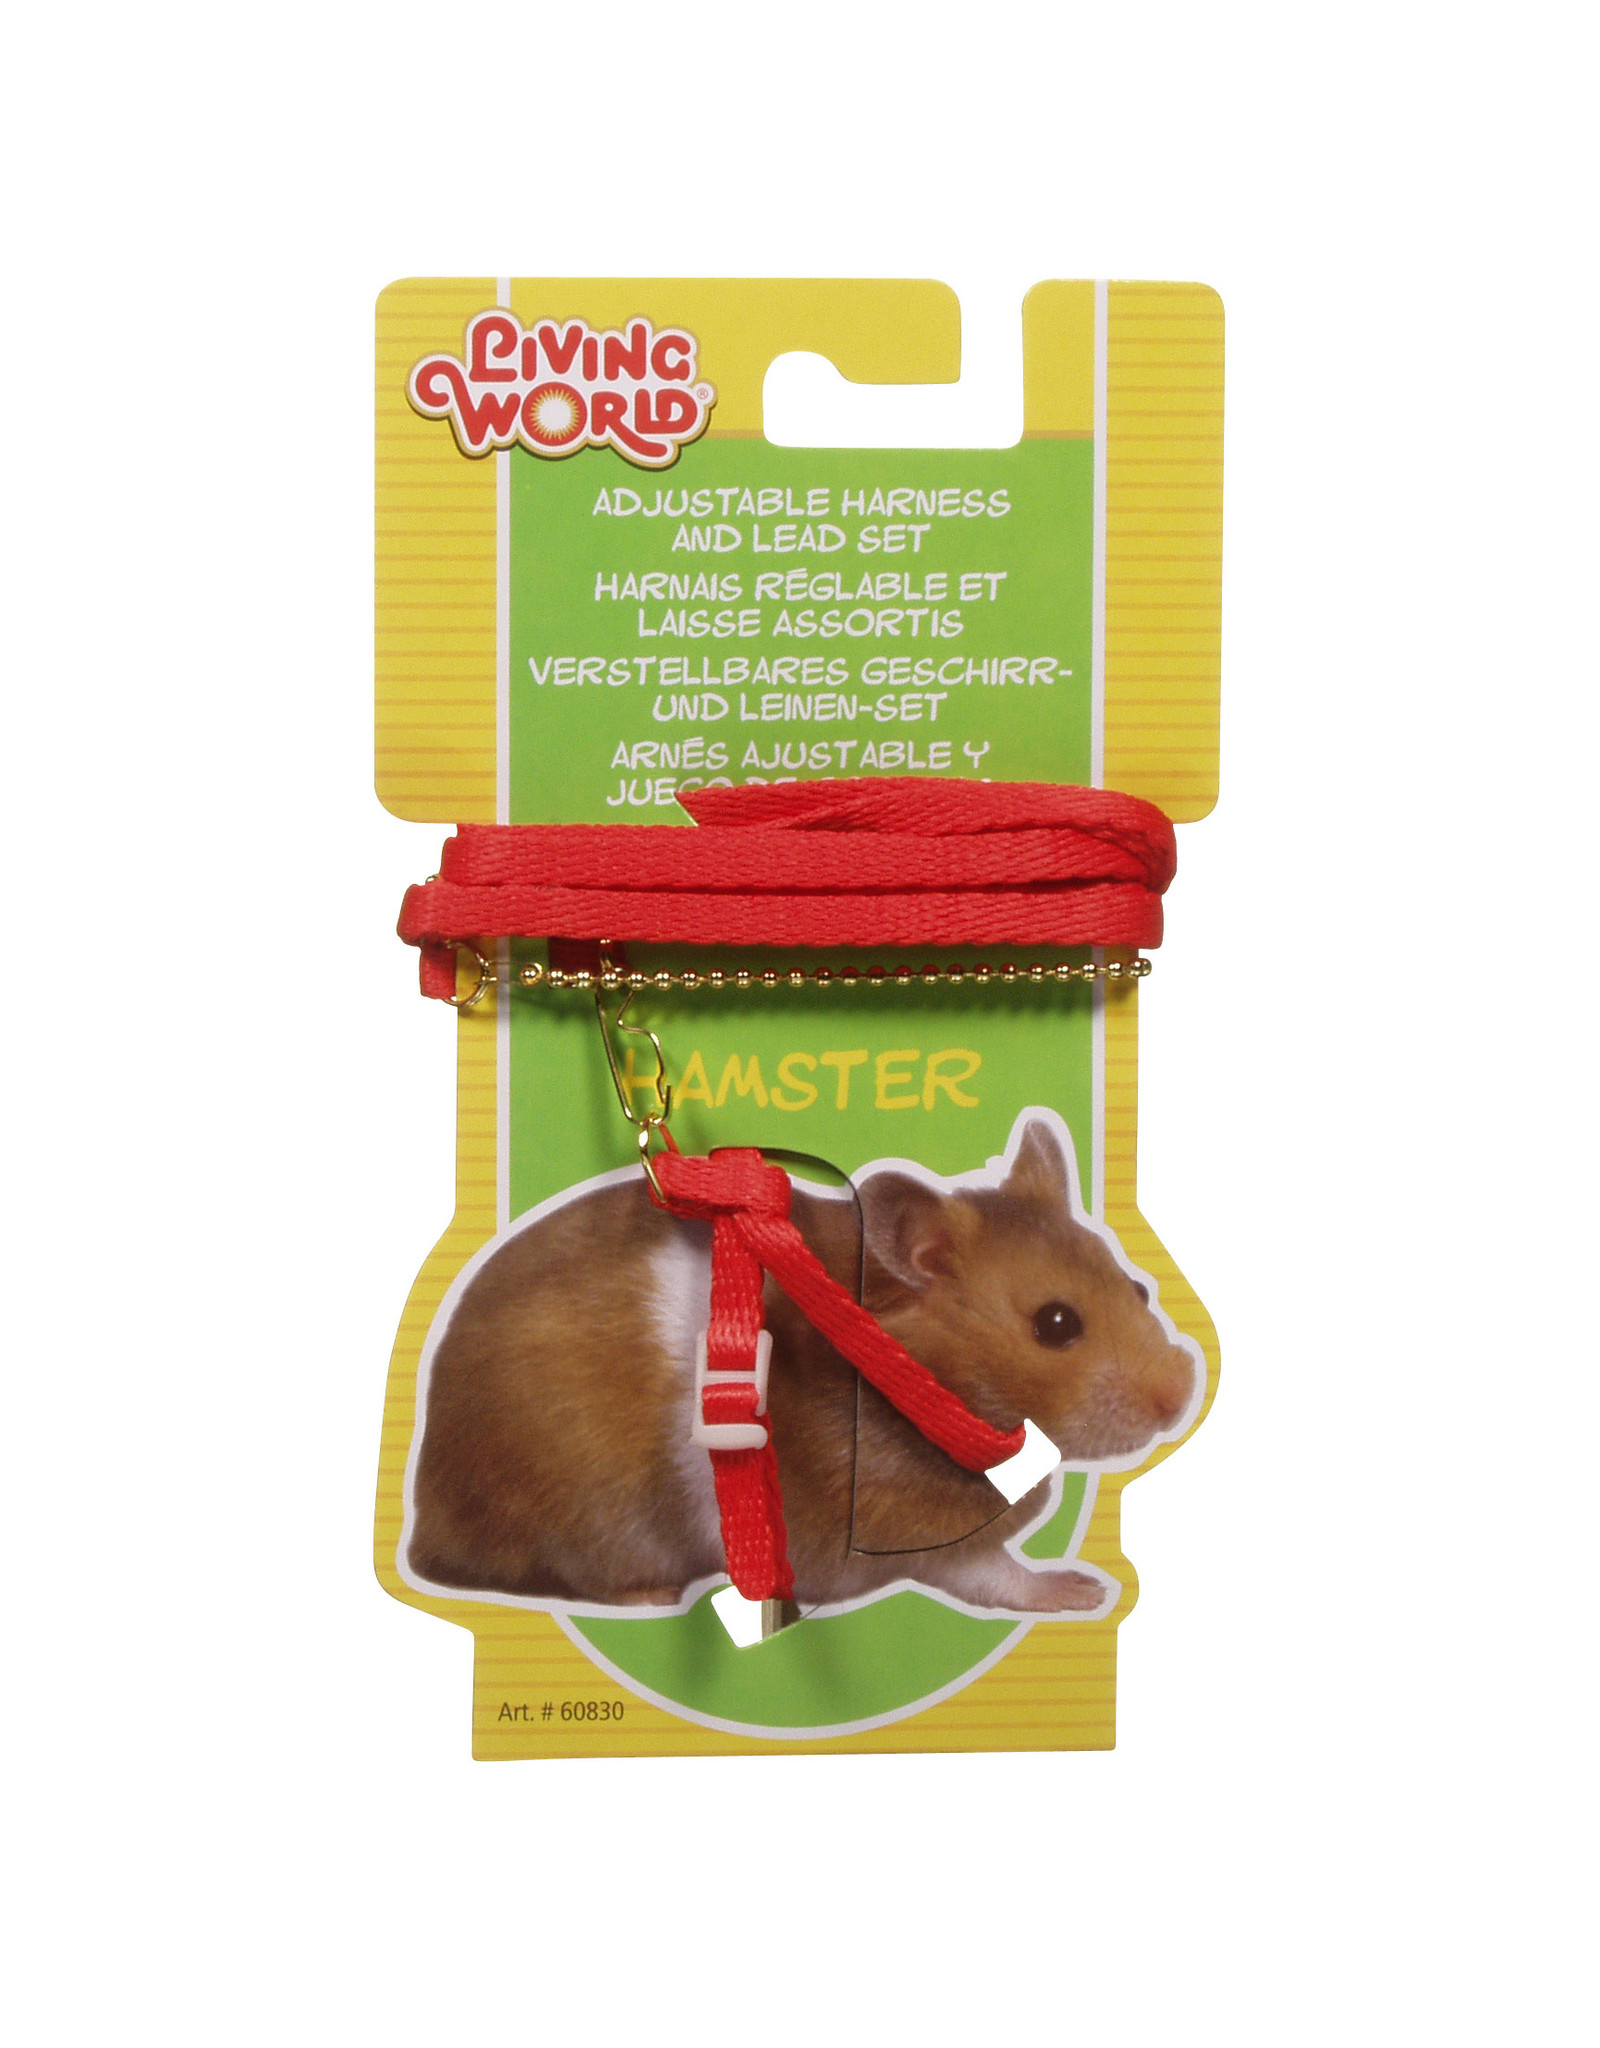 LW - Living World LW Hamster Figure 8 Harness & Lead Set Red